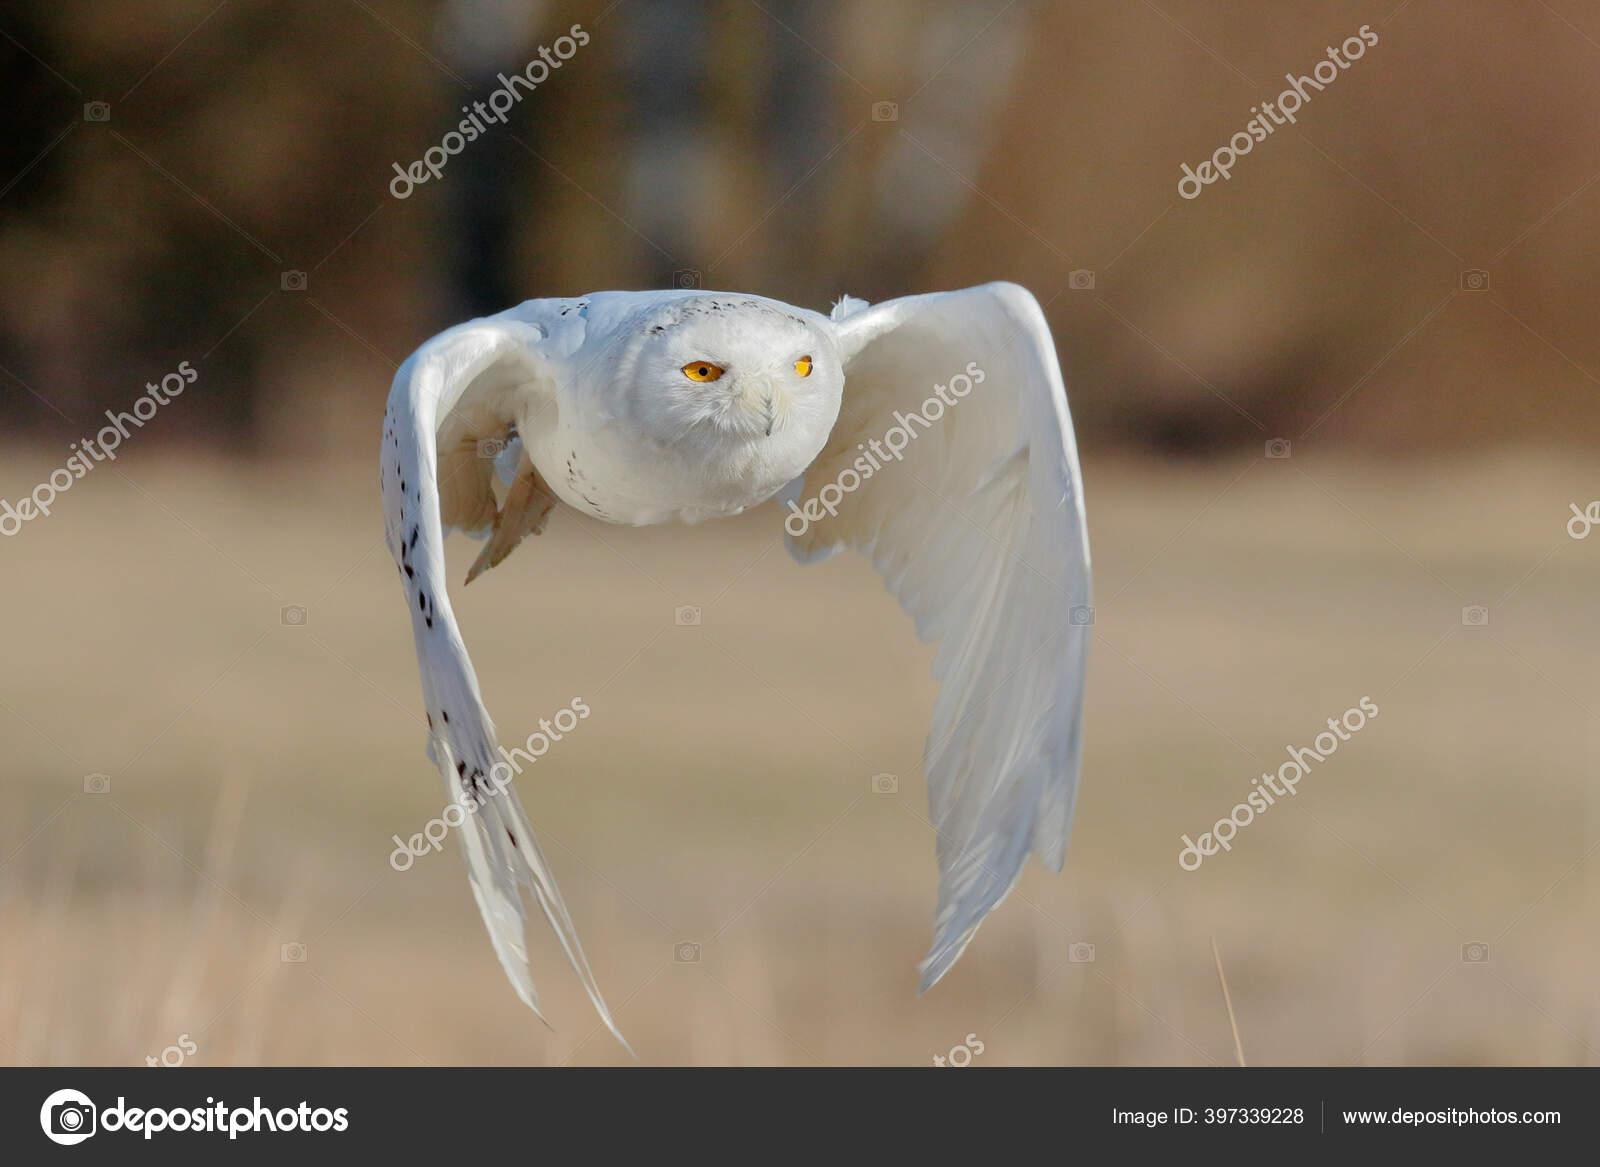 Seekor Burung Hantu Putih Besar Yang Kuat Dengan Mata Kuning Stok Foto C Danieldunca 397339228